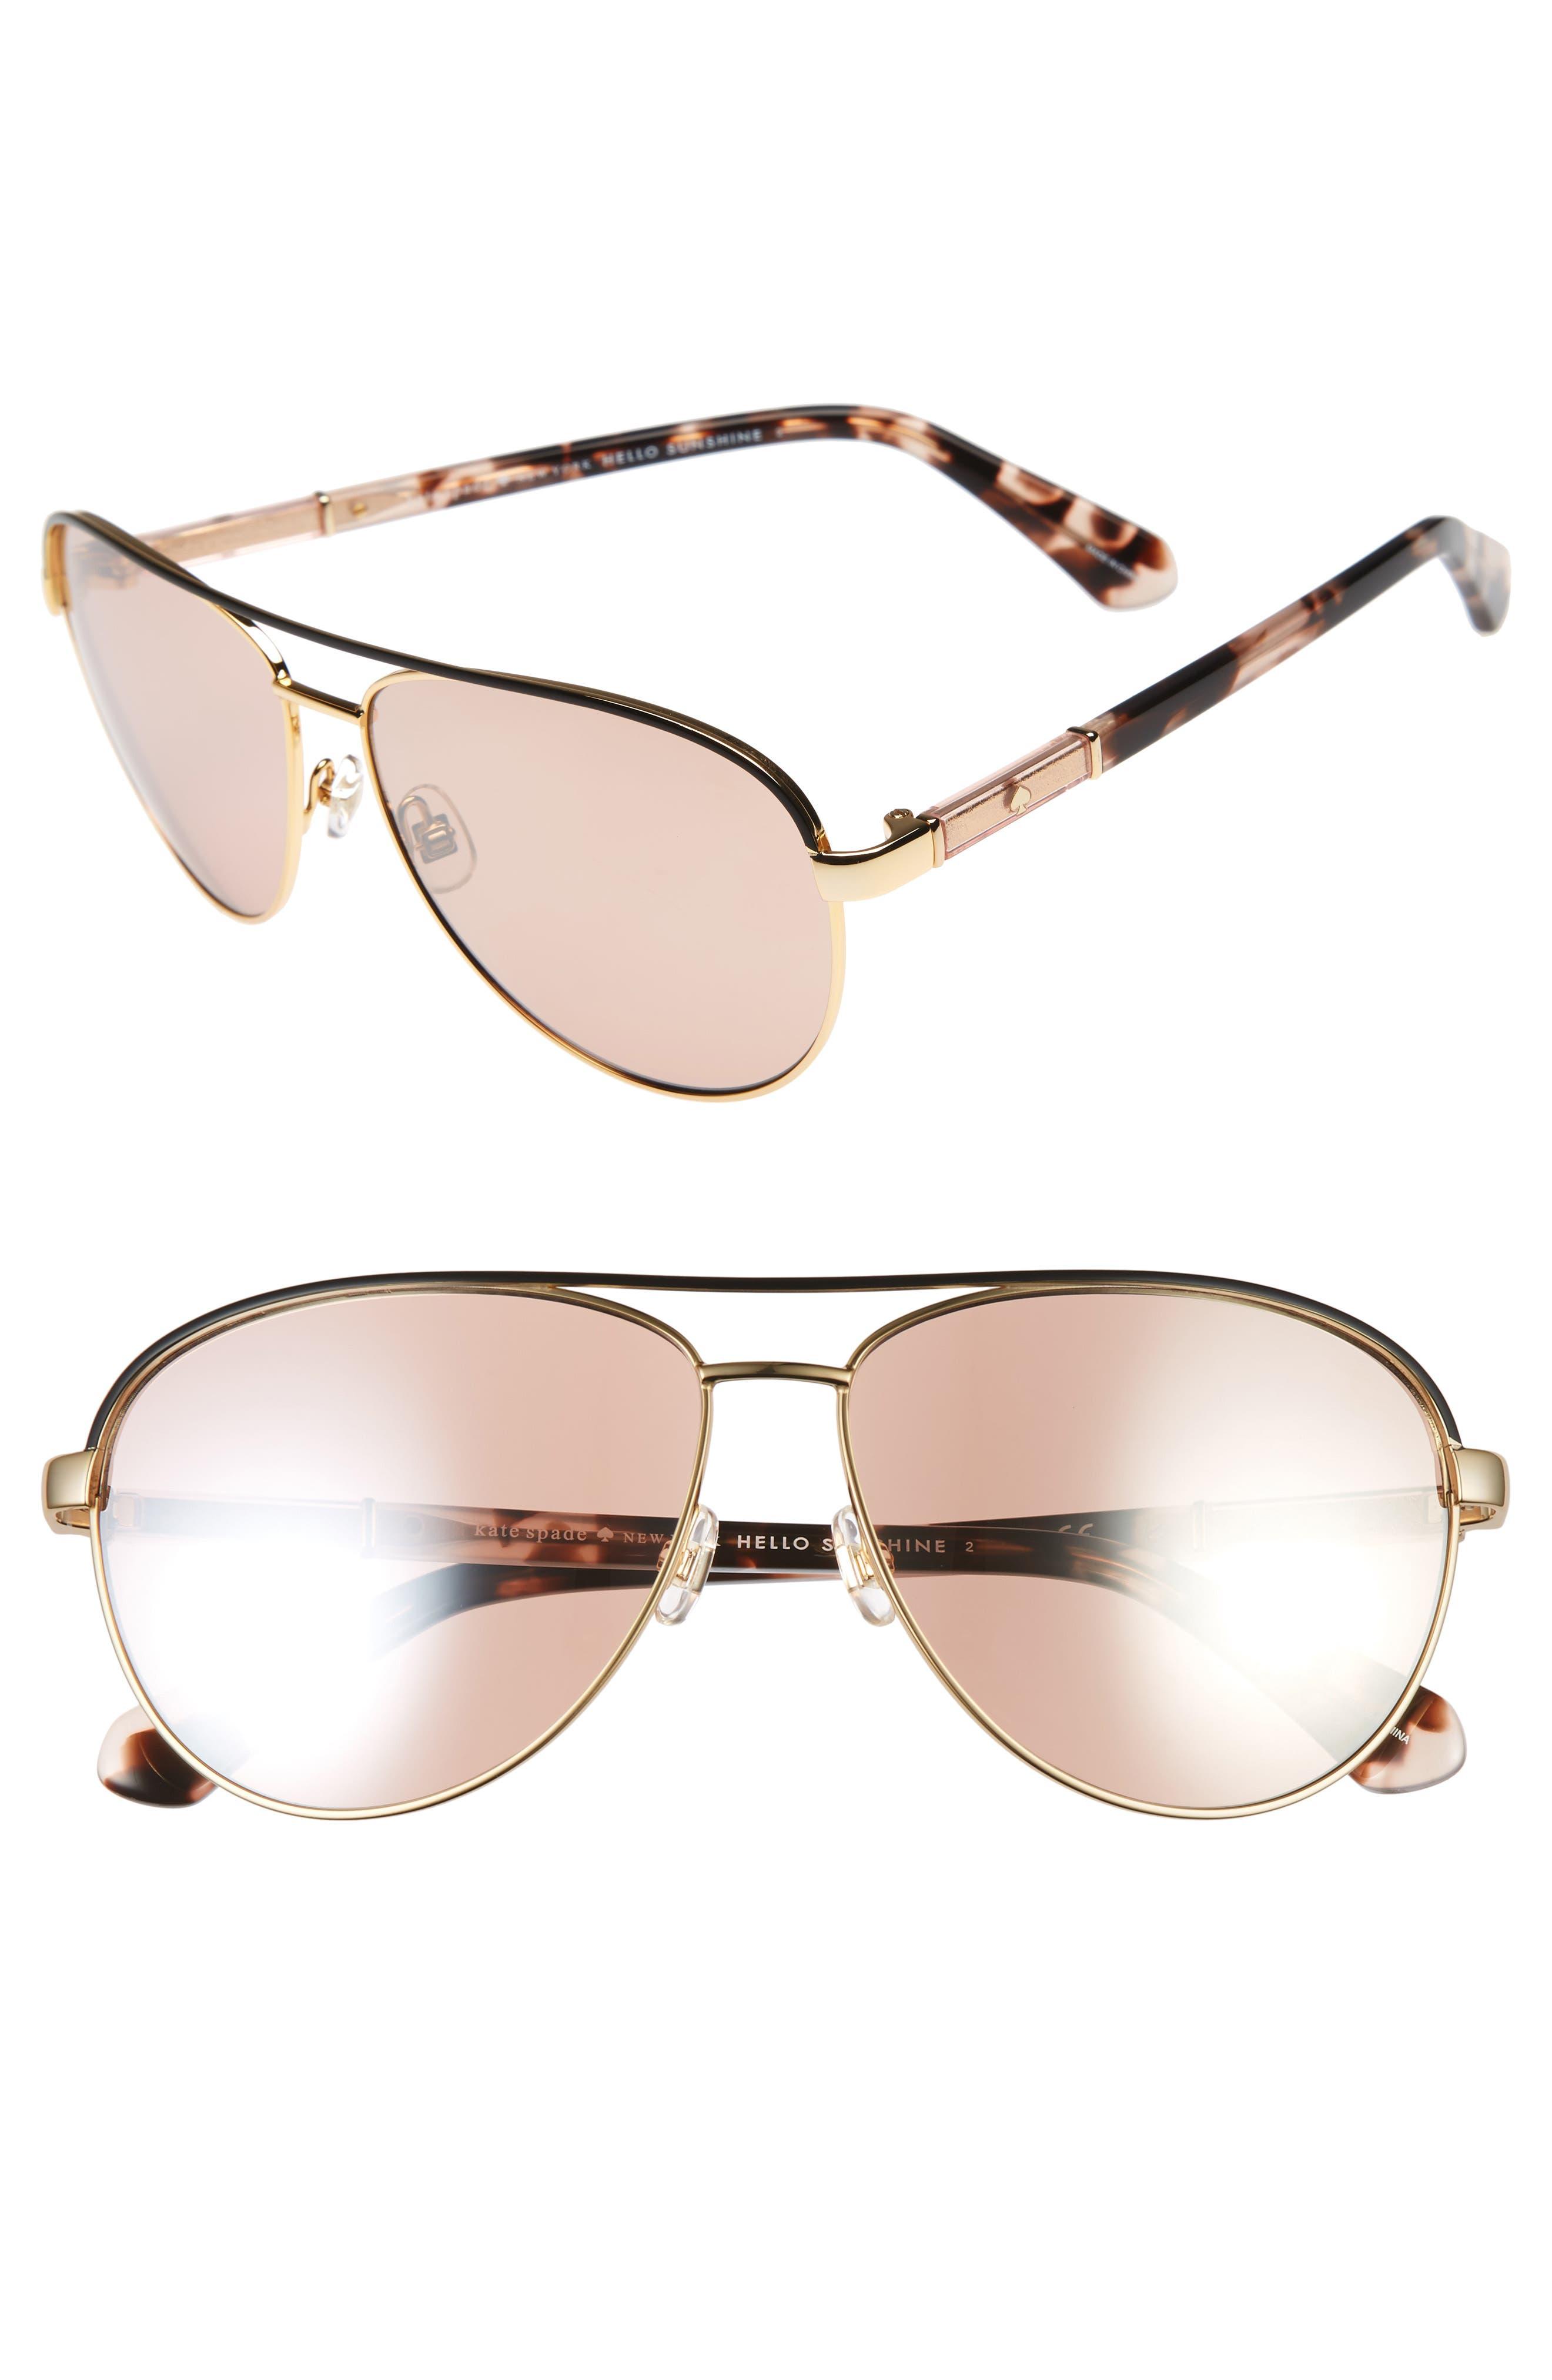 emilyann 59mm aviator sunglasses,                         Main,                         color, Gold/ Plum Havana